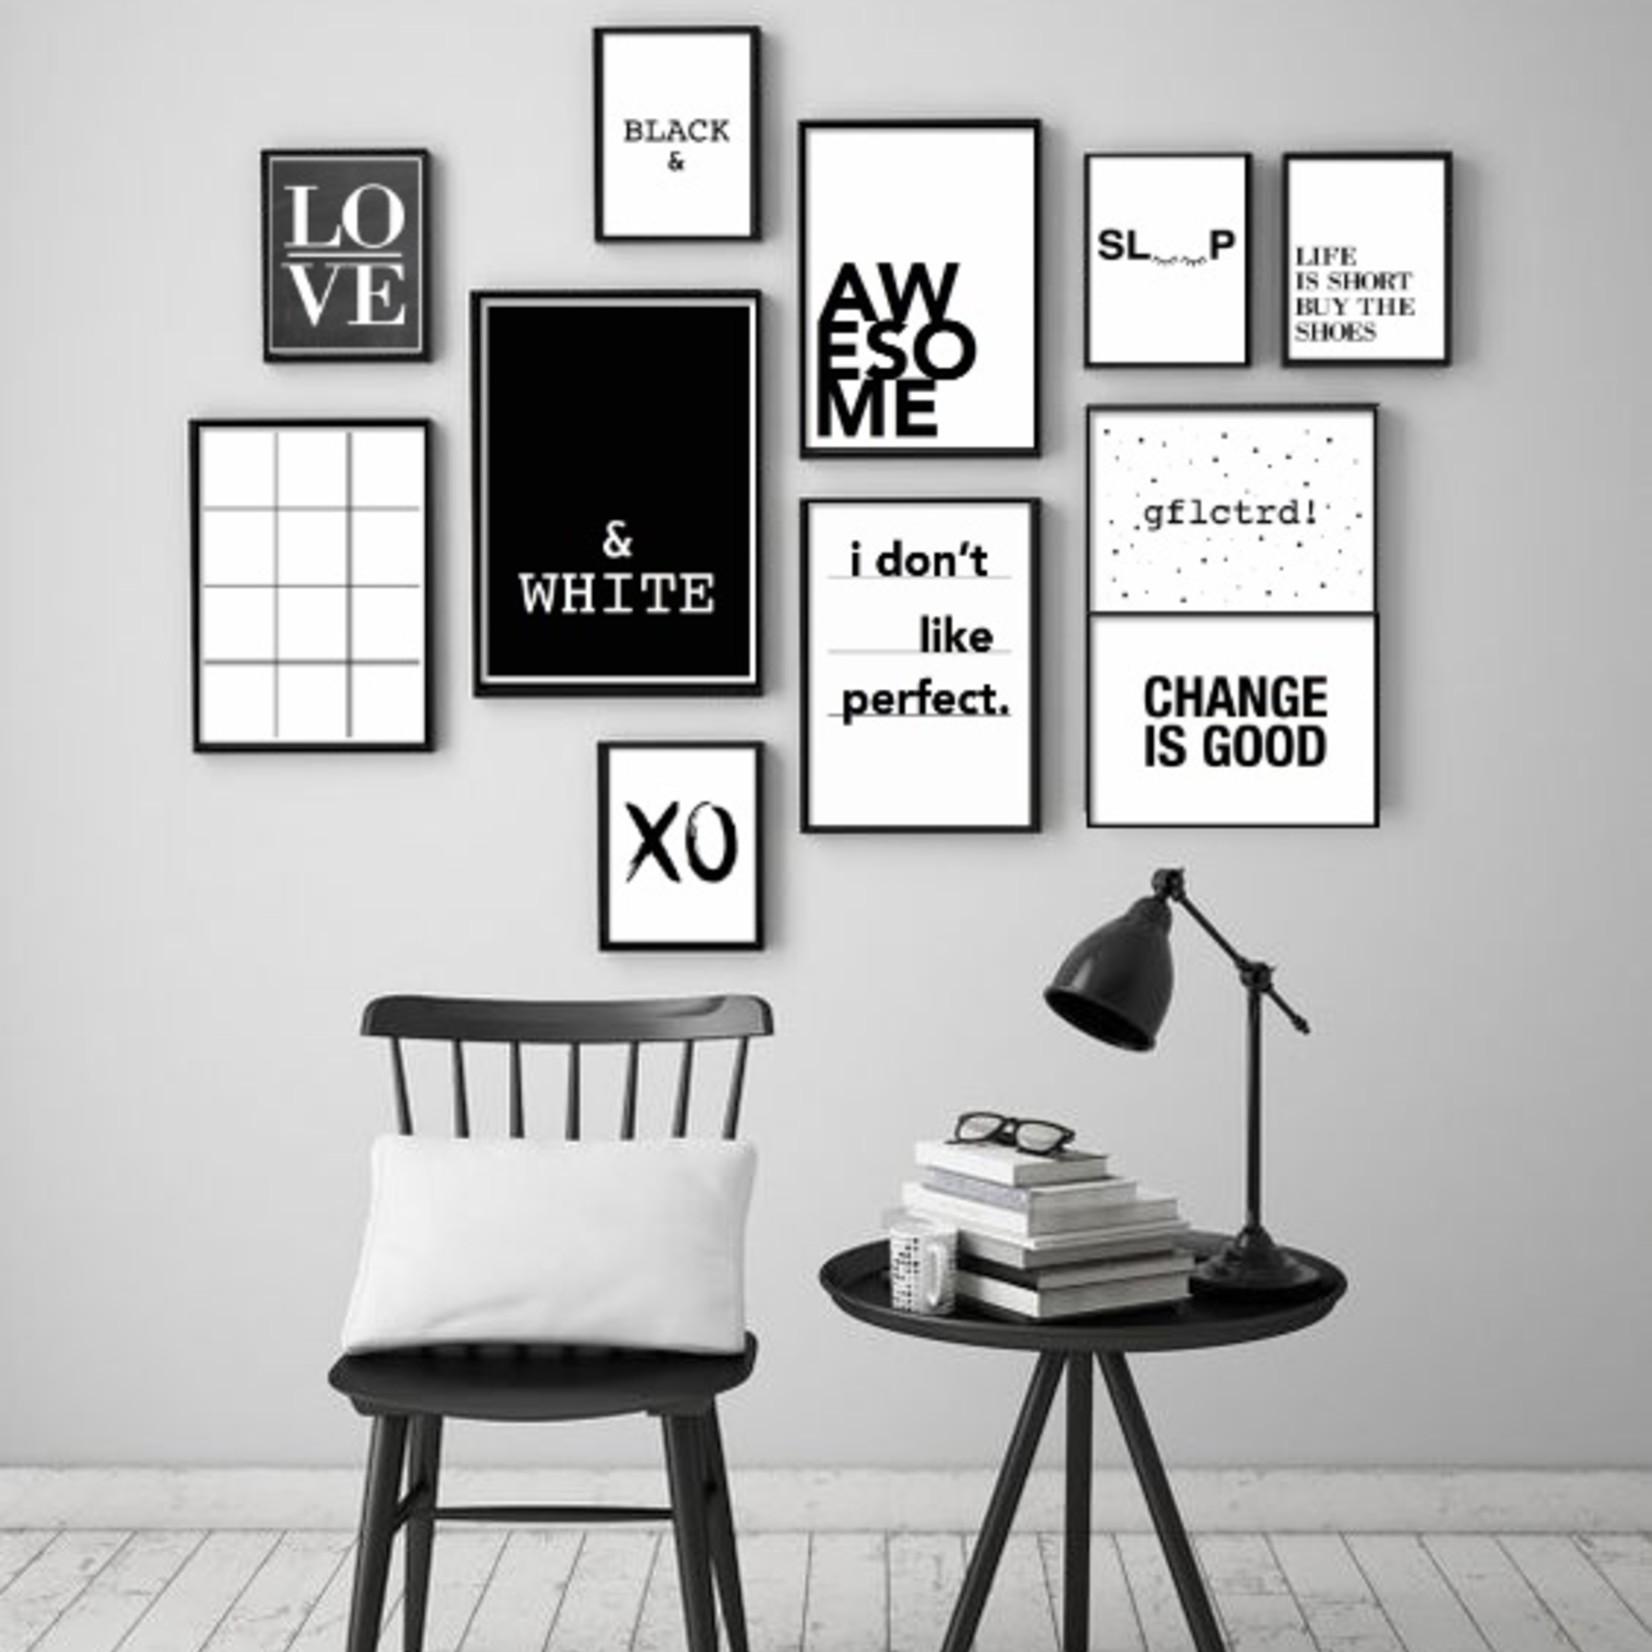 Pixelposter - & white (A4)